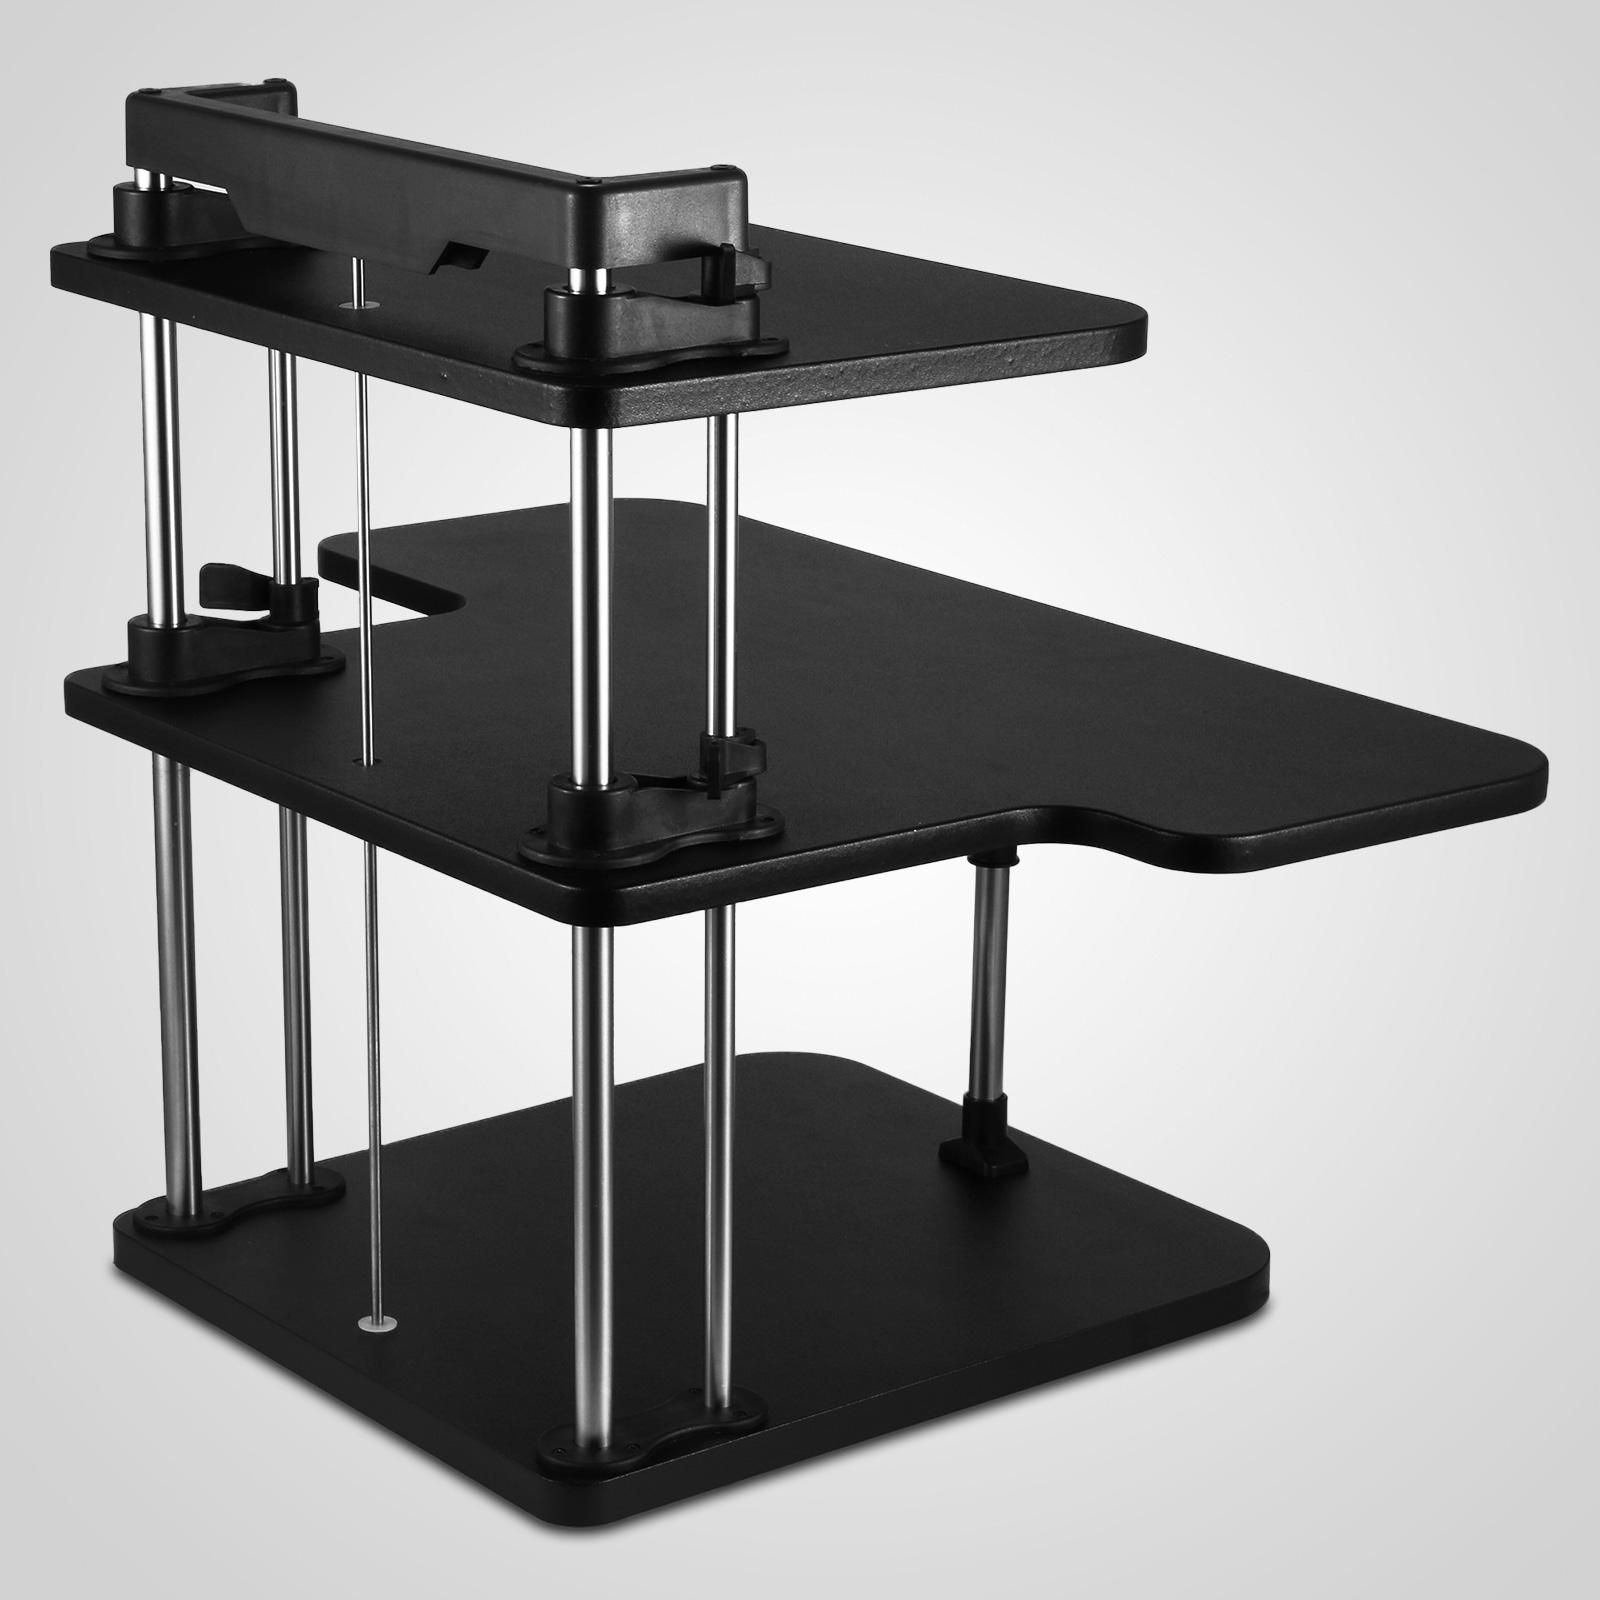 3 tier adjustable computer standing desk height adjustable stand up extra strong ebay. Black Bedroom Furniture Sets. Home Design Ideas